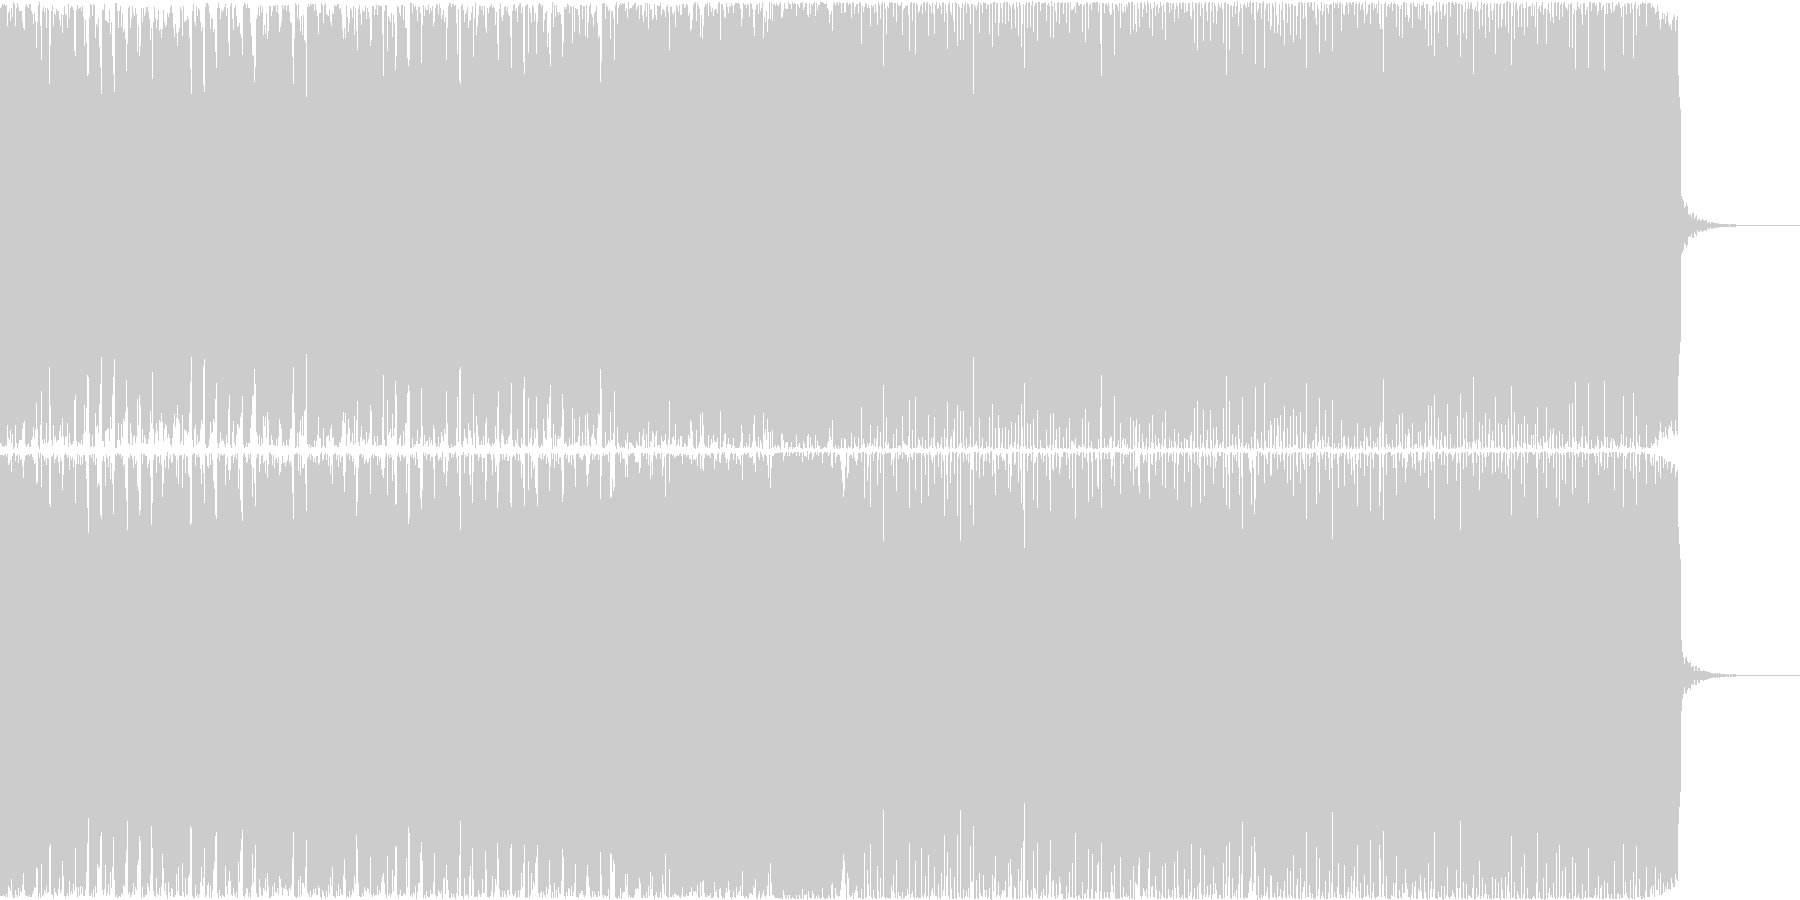 【EDM風】爽やか、ポップなCM、BGMの未再生の波形